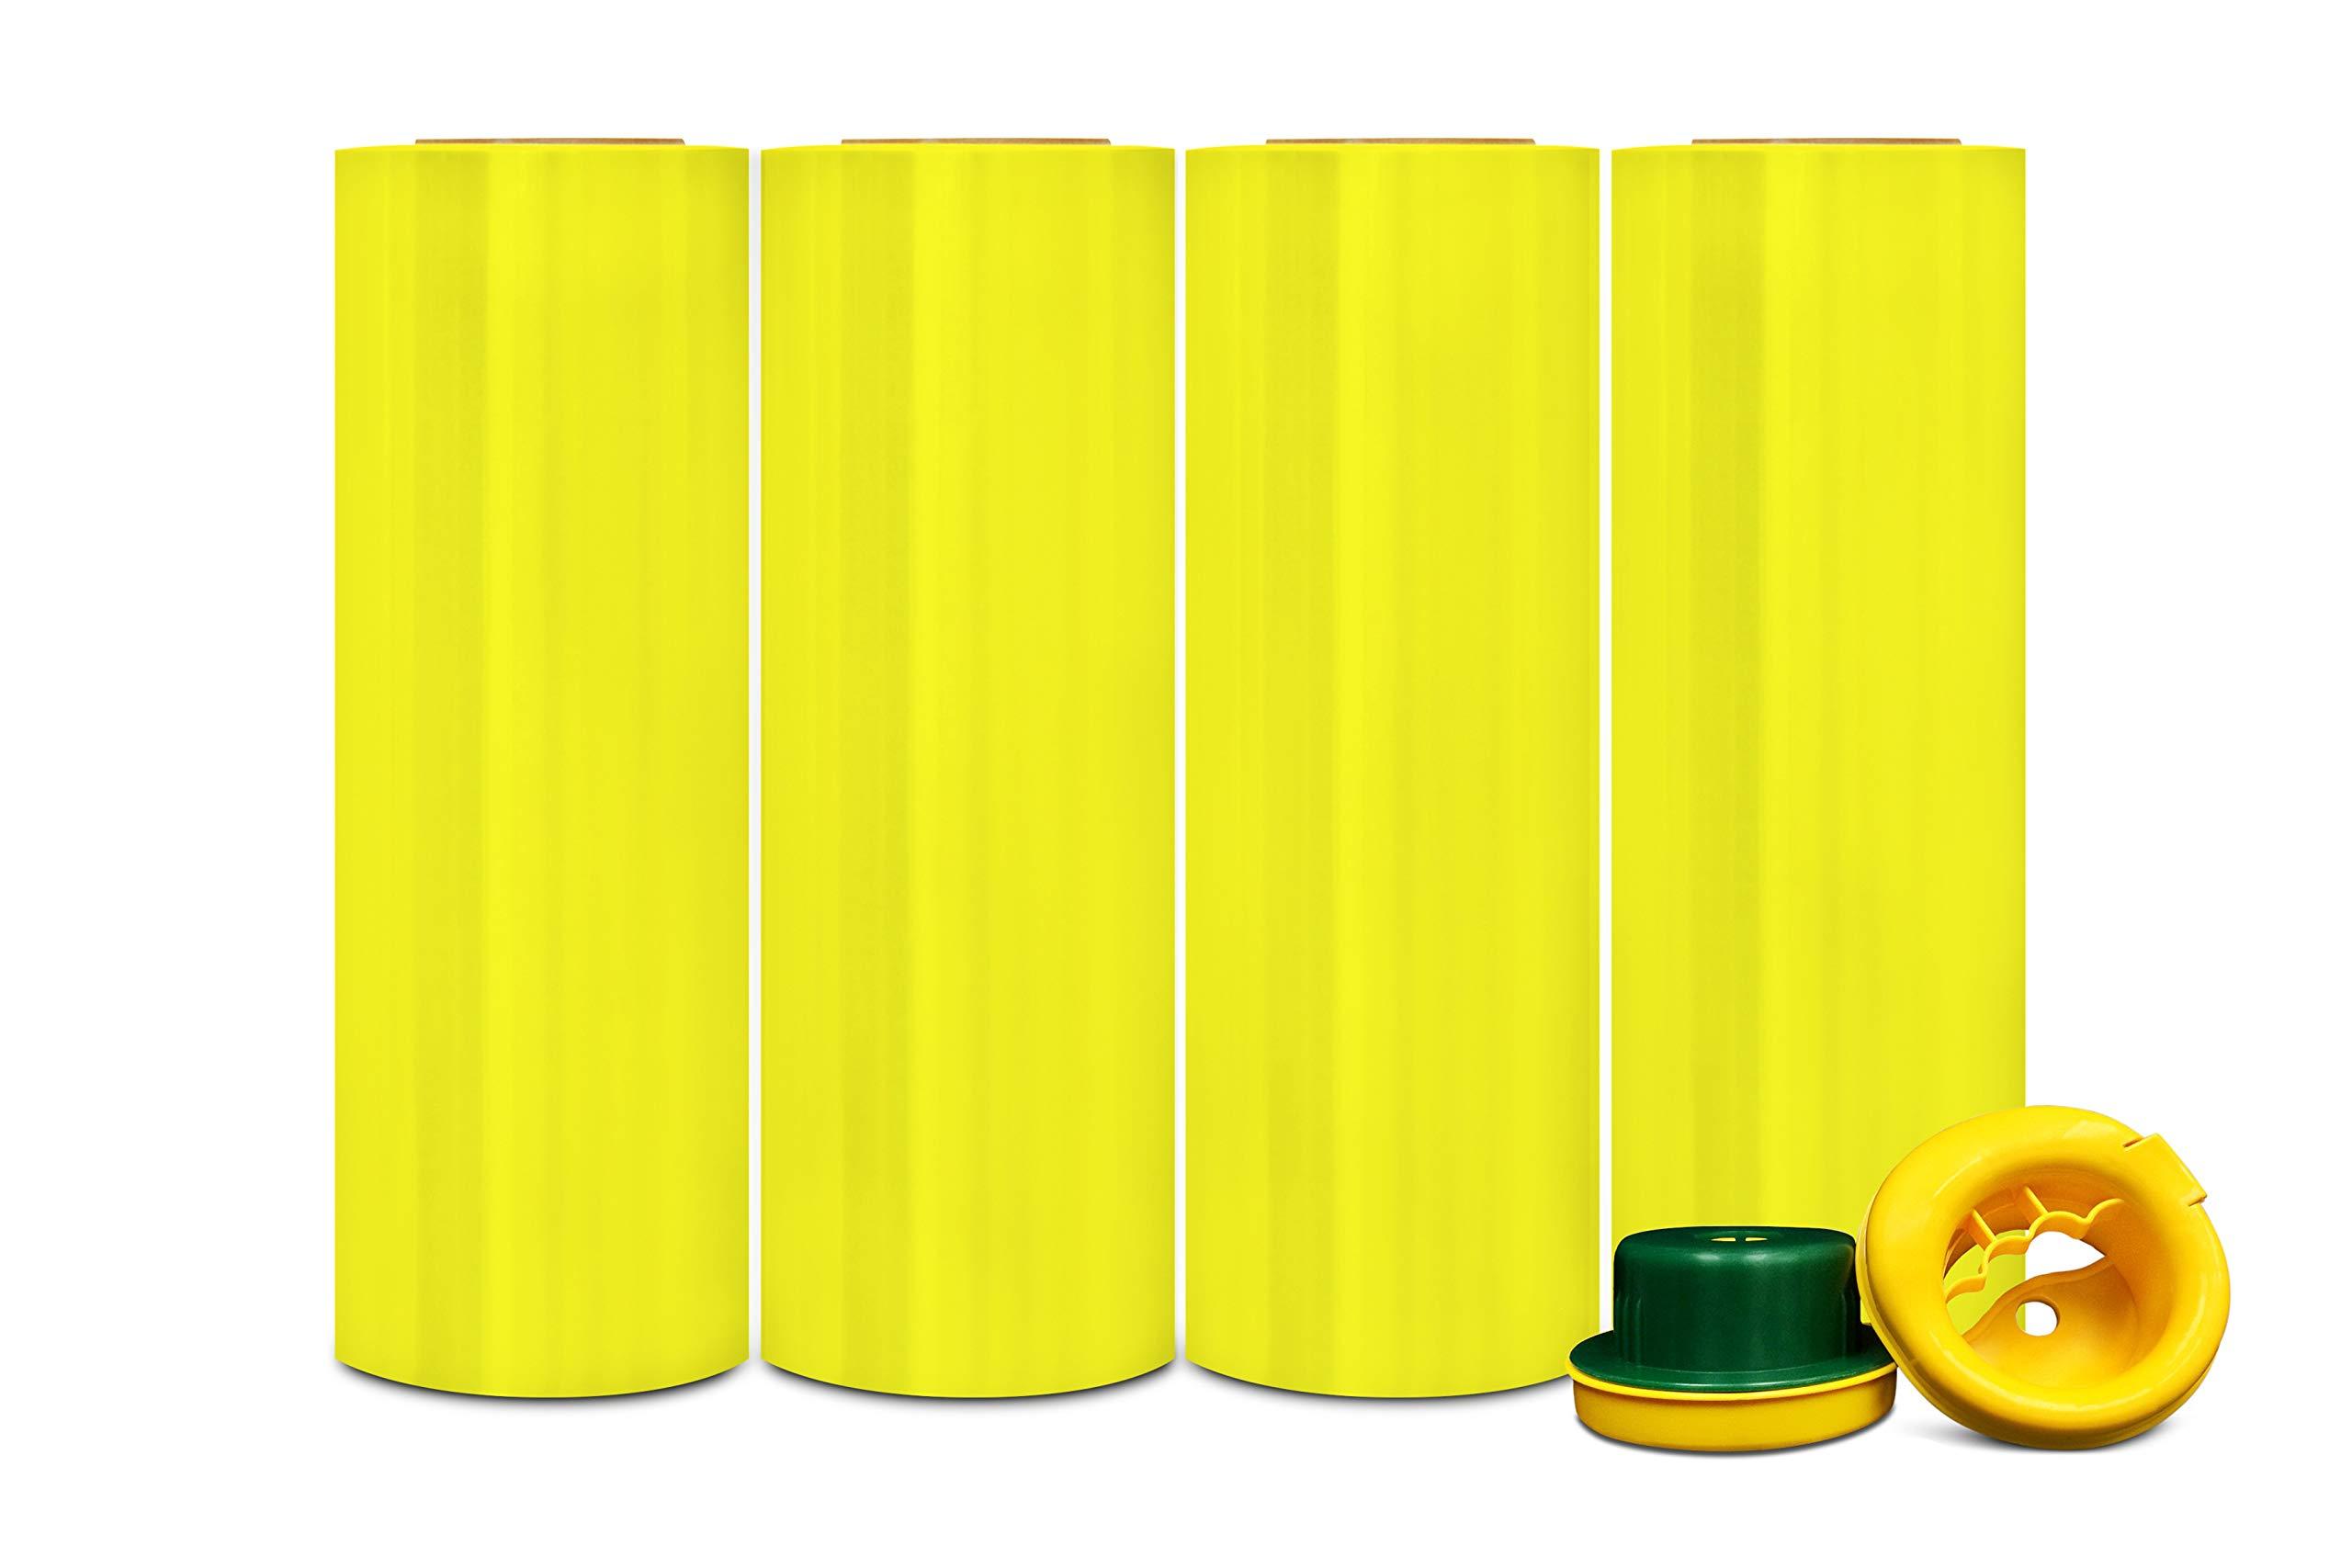 Yellow Pre-Stretch Film Hand Stretch Wrap 17'' x 1476' 8 Mic. (32 Gauge) 4 Rolls + Hand Saver by PackagingSuppliesByMail